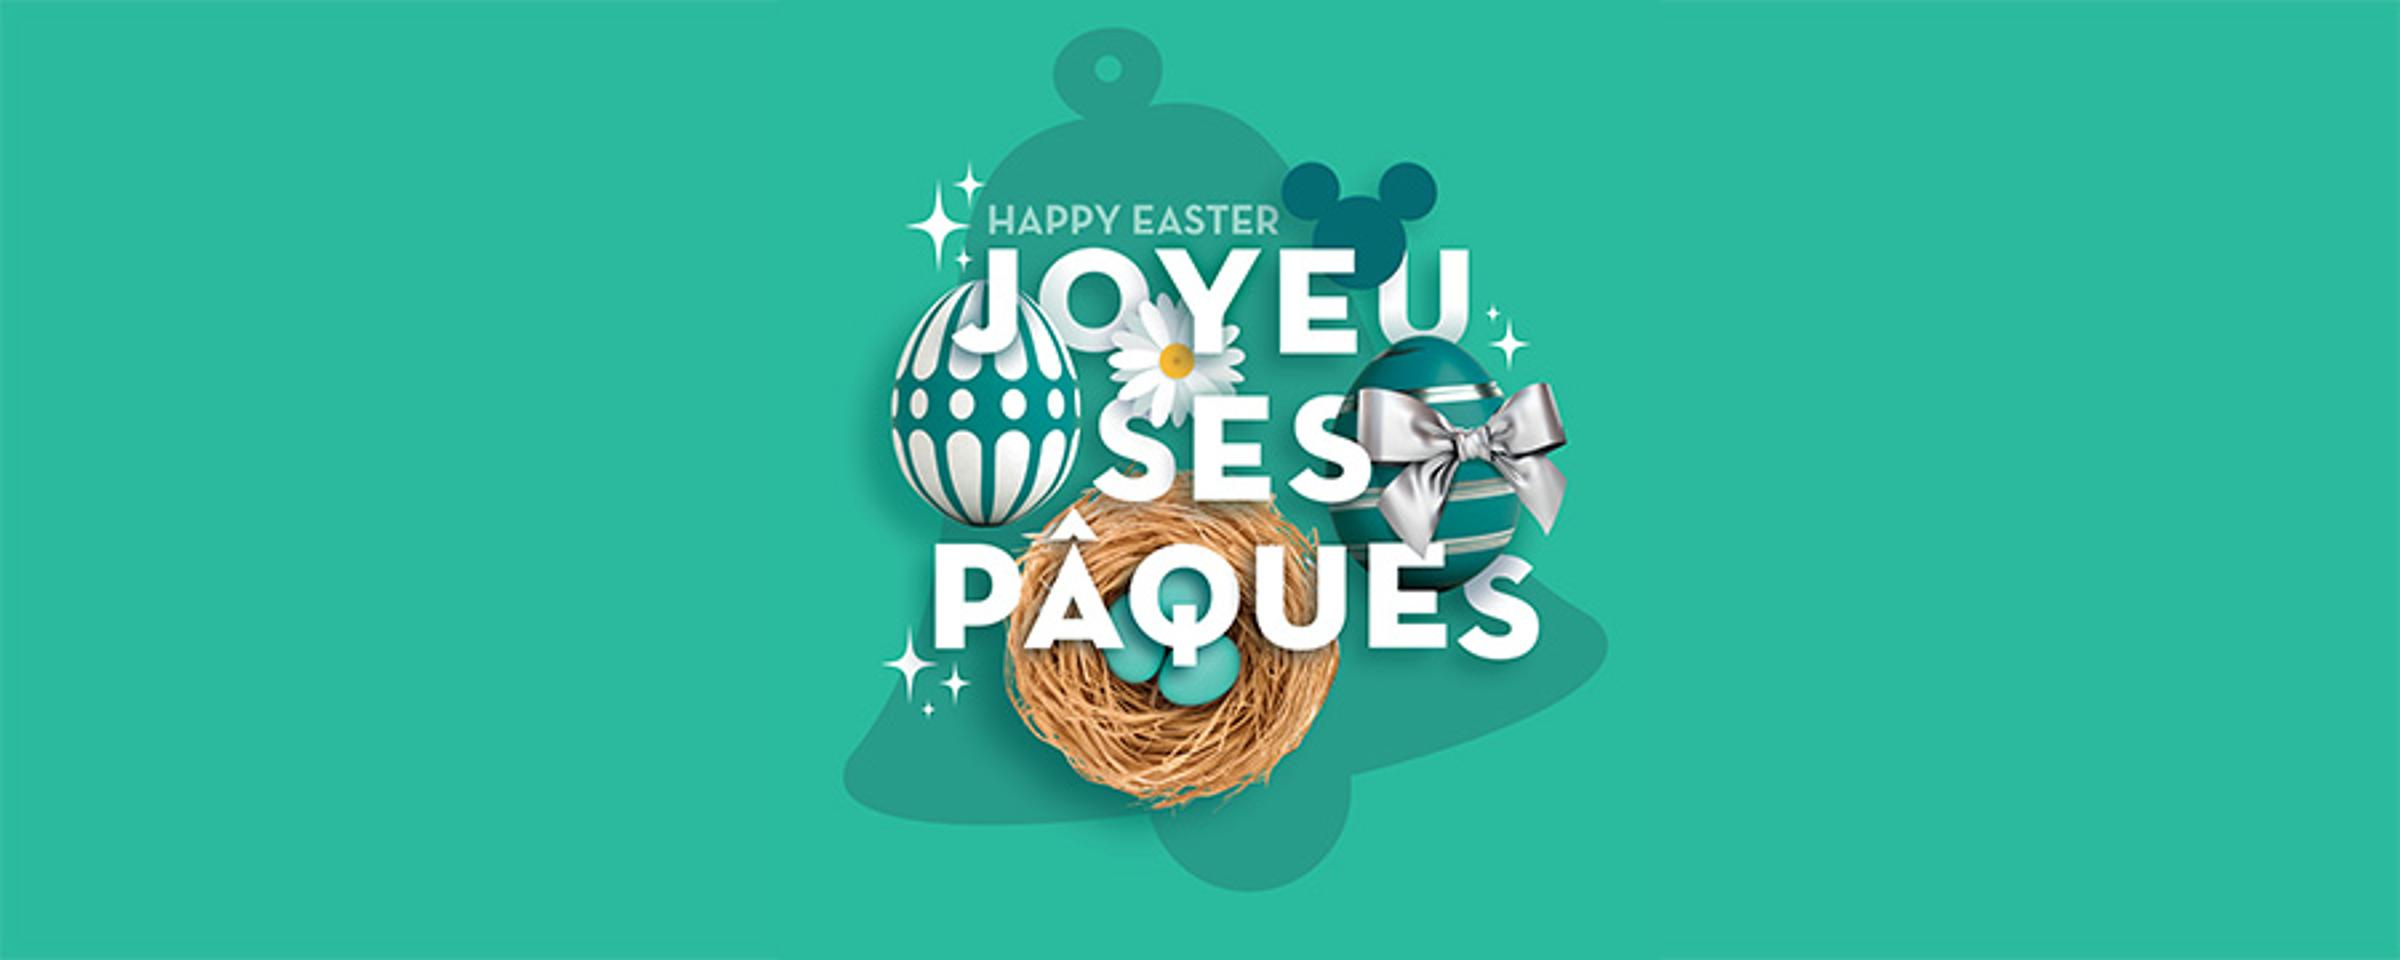 Hd13884_2050dec31_world_disney Village Easter Fr 2018_900x360_tcm808 163055 2400x960